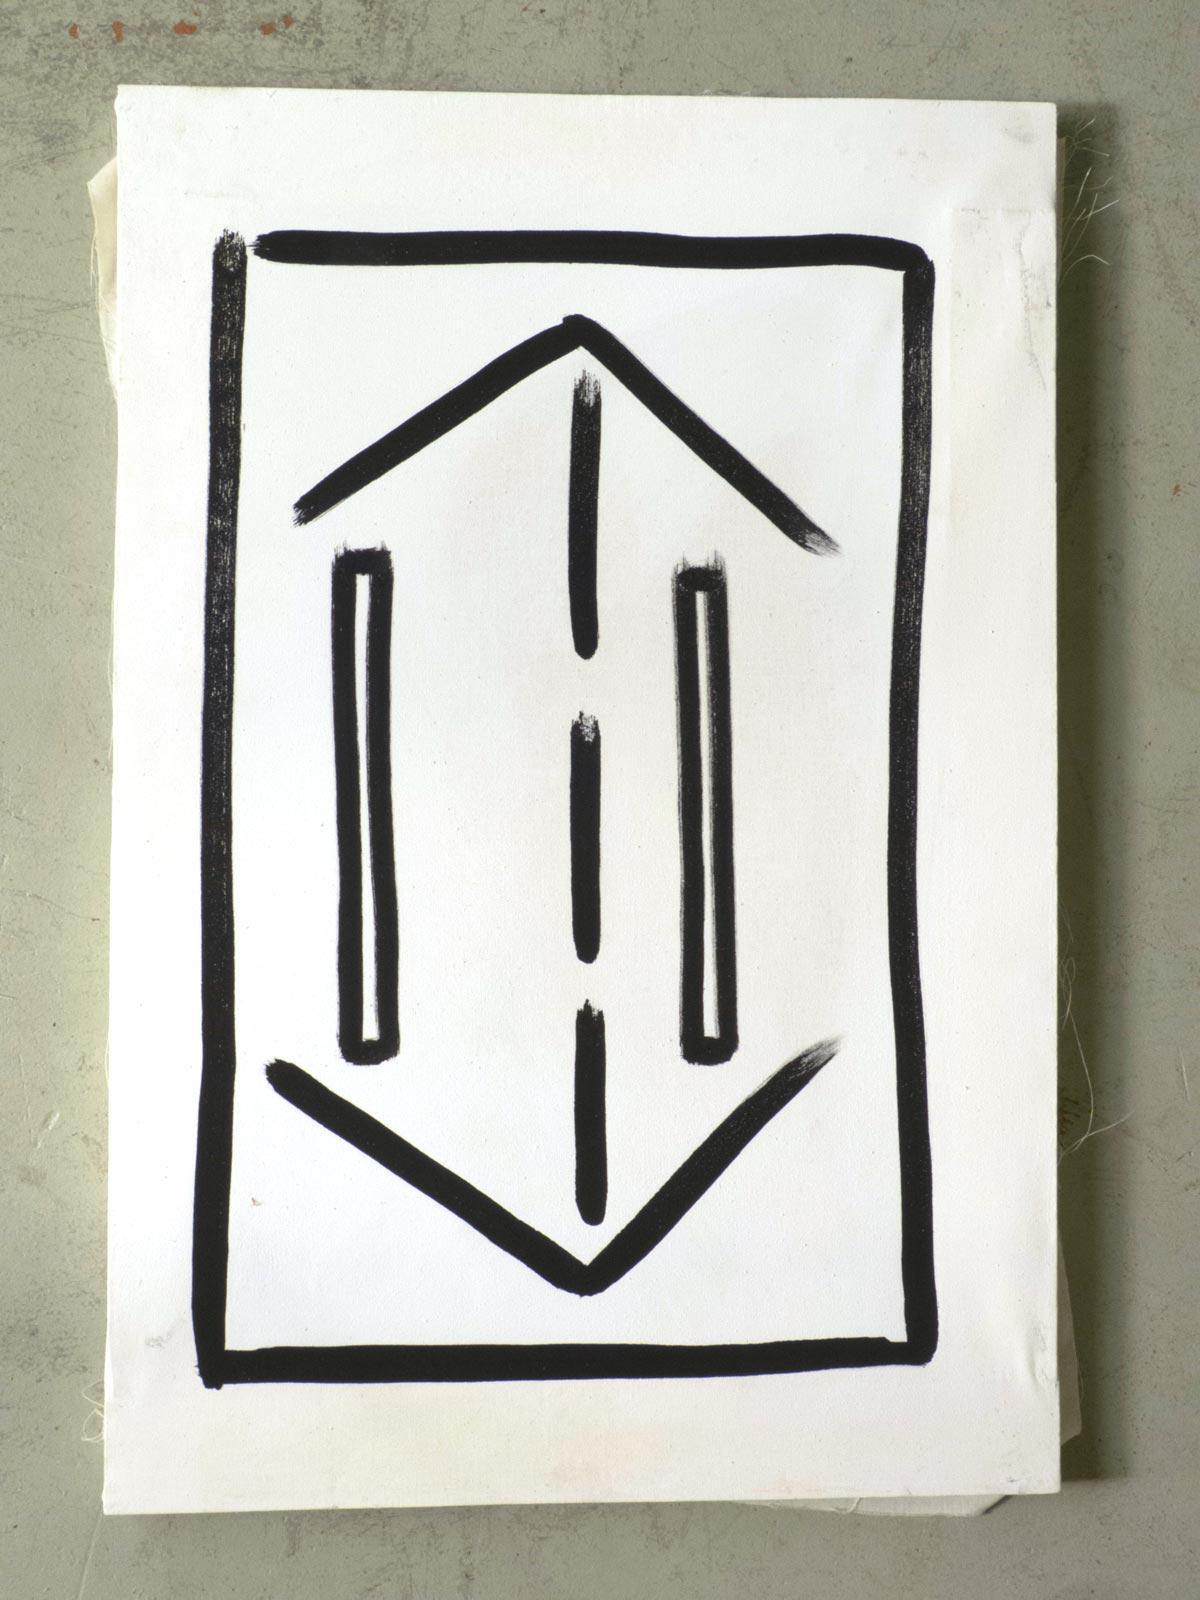 Urban-Manegold-There-is-no-Private-Privatleben-Privatsphäre-Rauminstallation-Experiment-Typographie-Portrait-Gesellschaft-Licht-Kunst-Transparent-LED-Madlight-portrait_multiplex_4